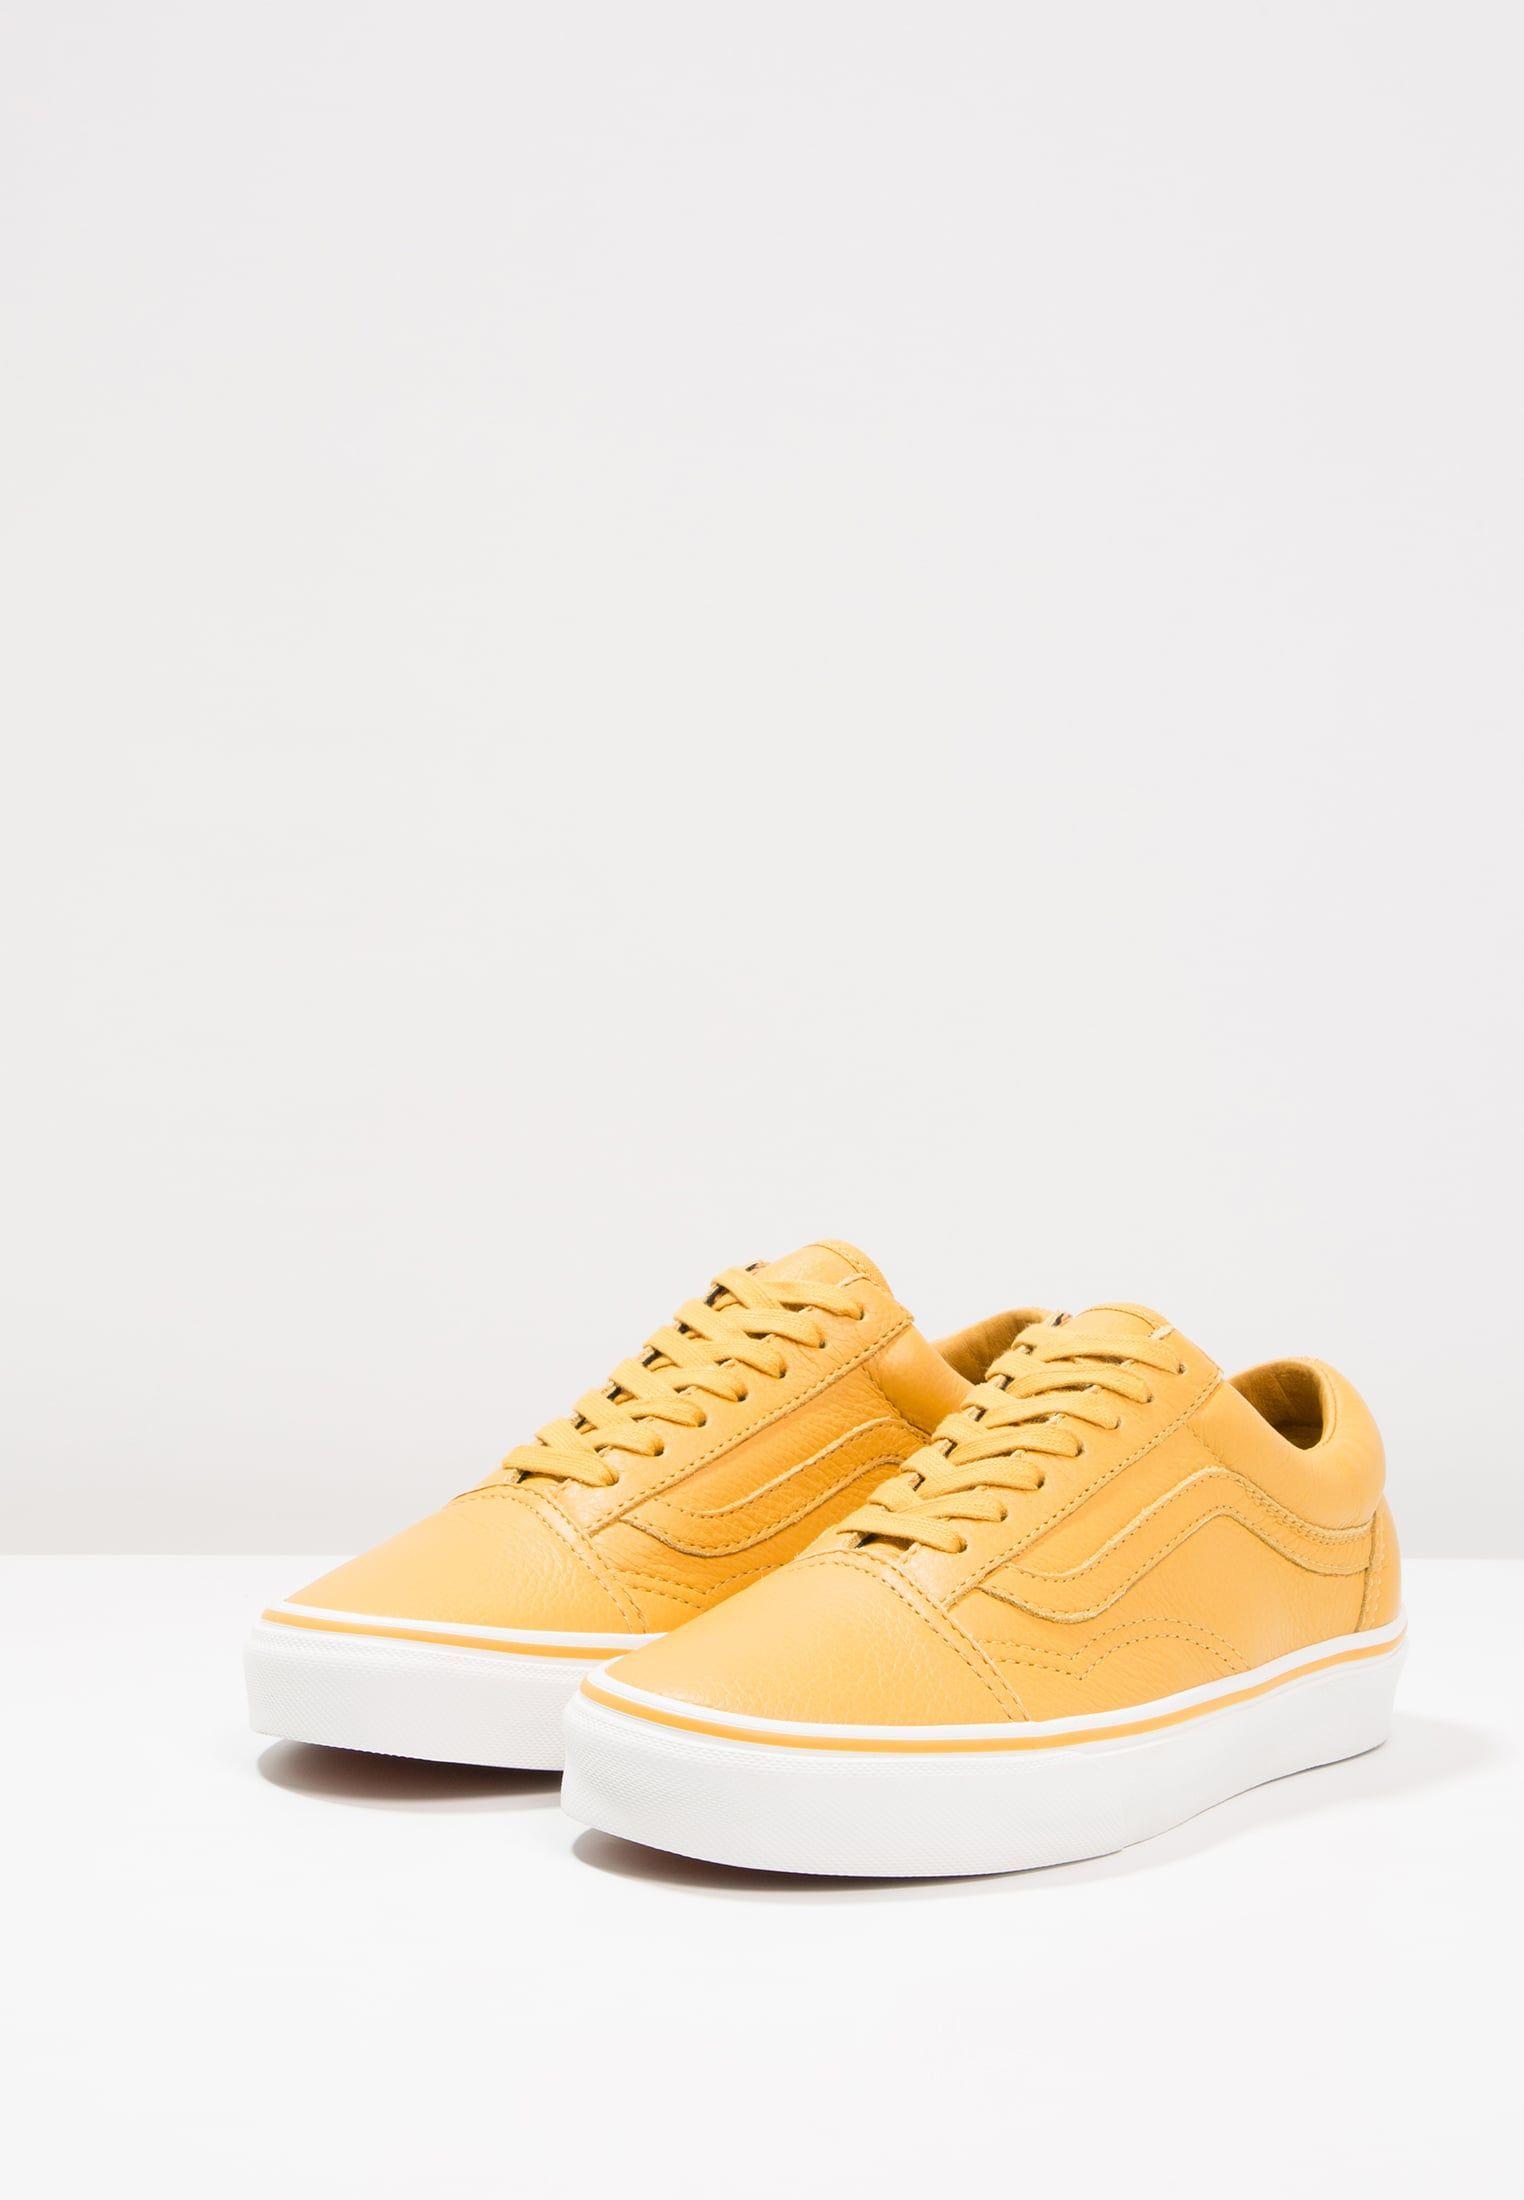 Vans UA OLD SKOOL - Zapatillas mineral yellow/blanc de blanc 7Ny9Tn9D